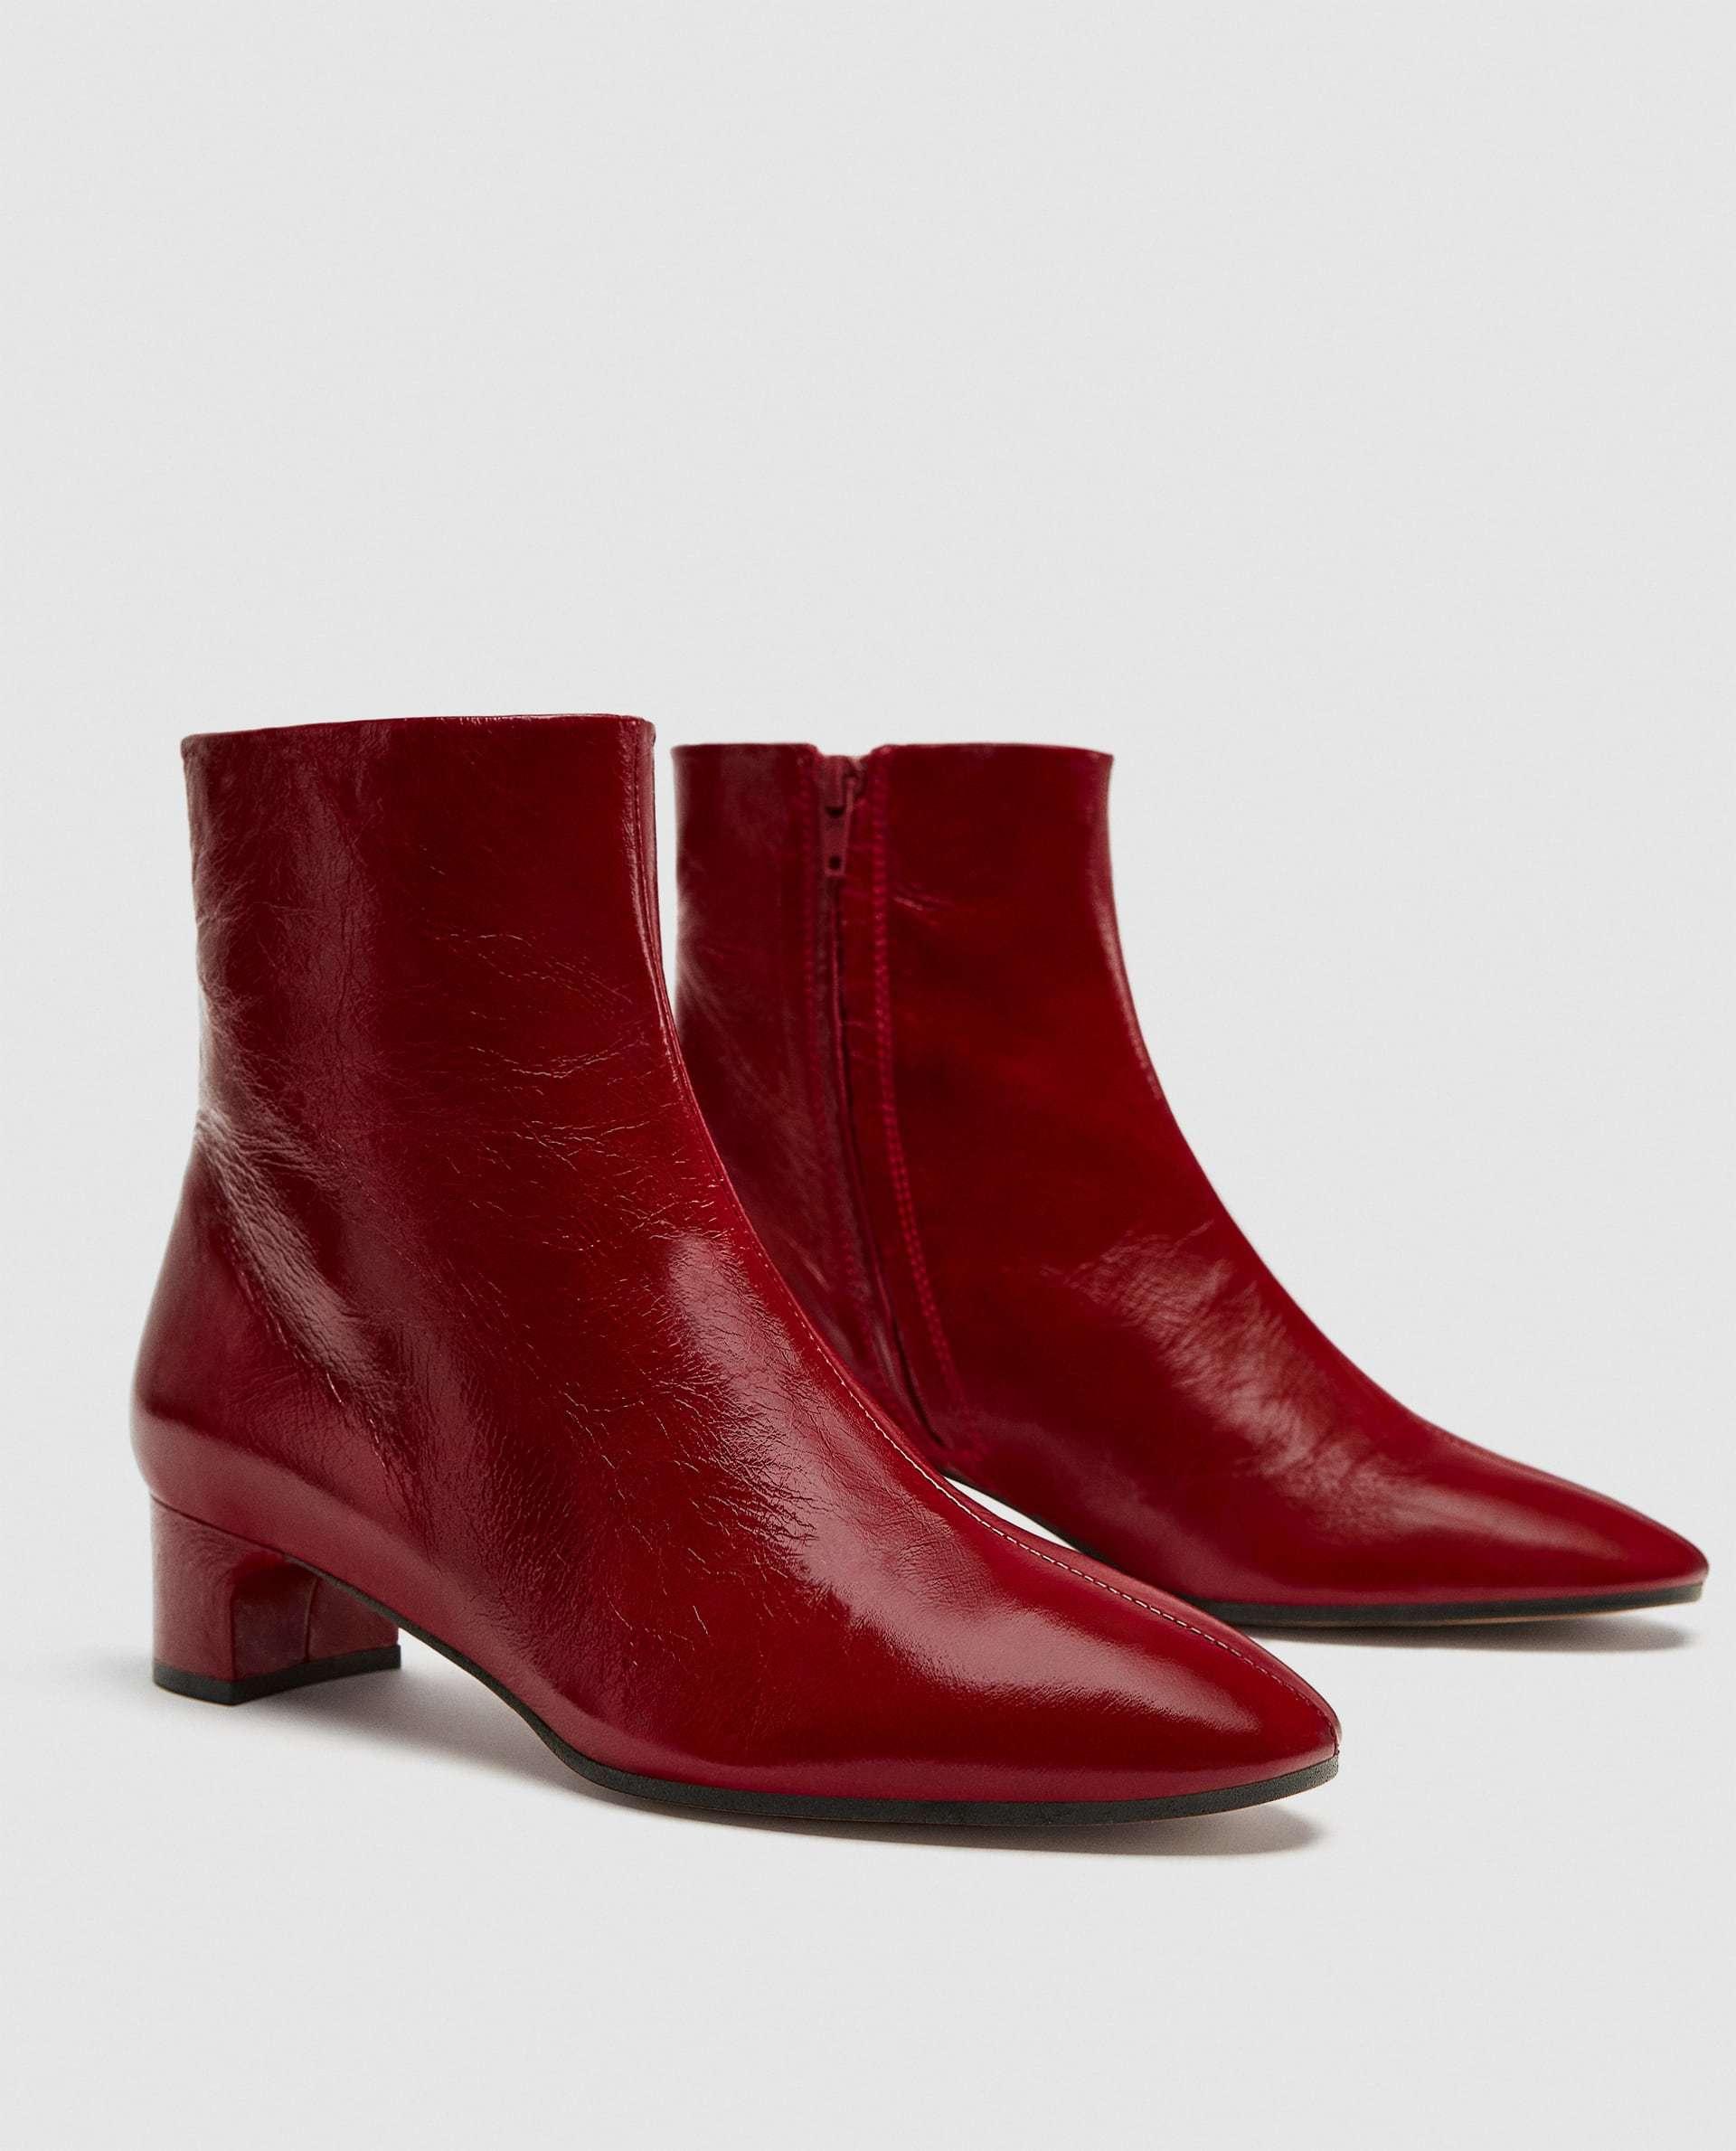 Botín de piel rojo de Zara (29,95 euros)